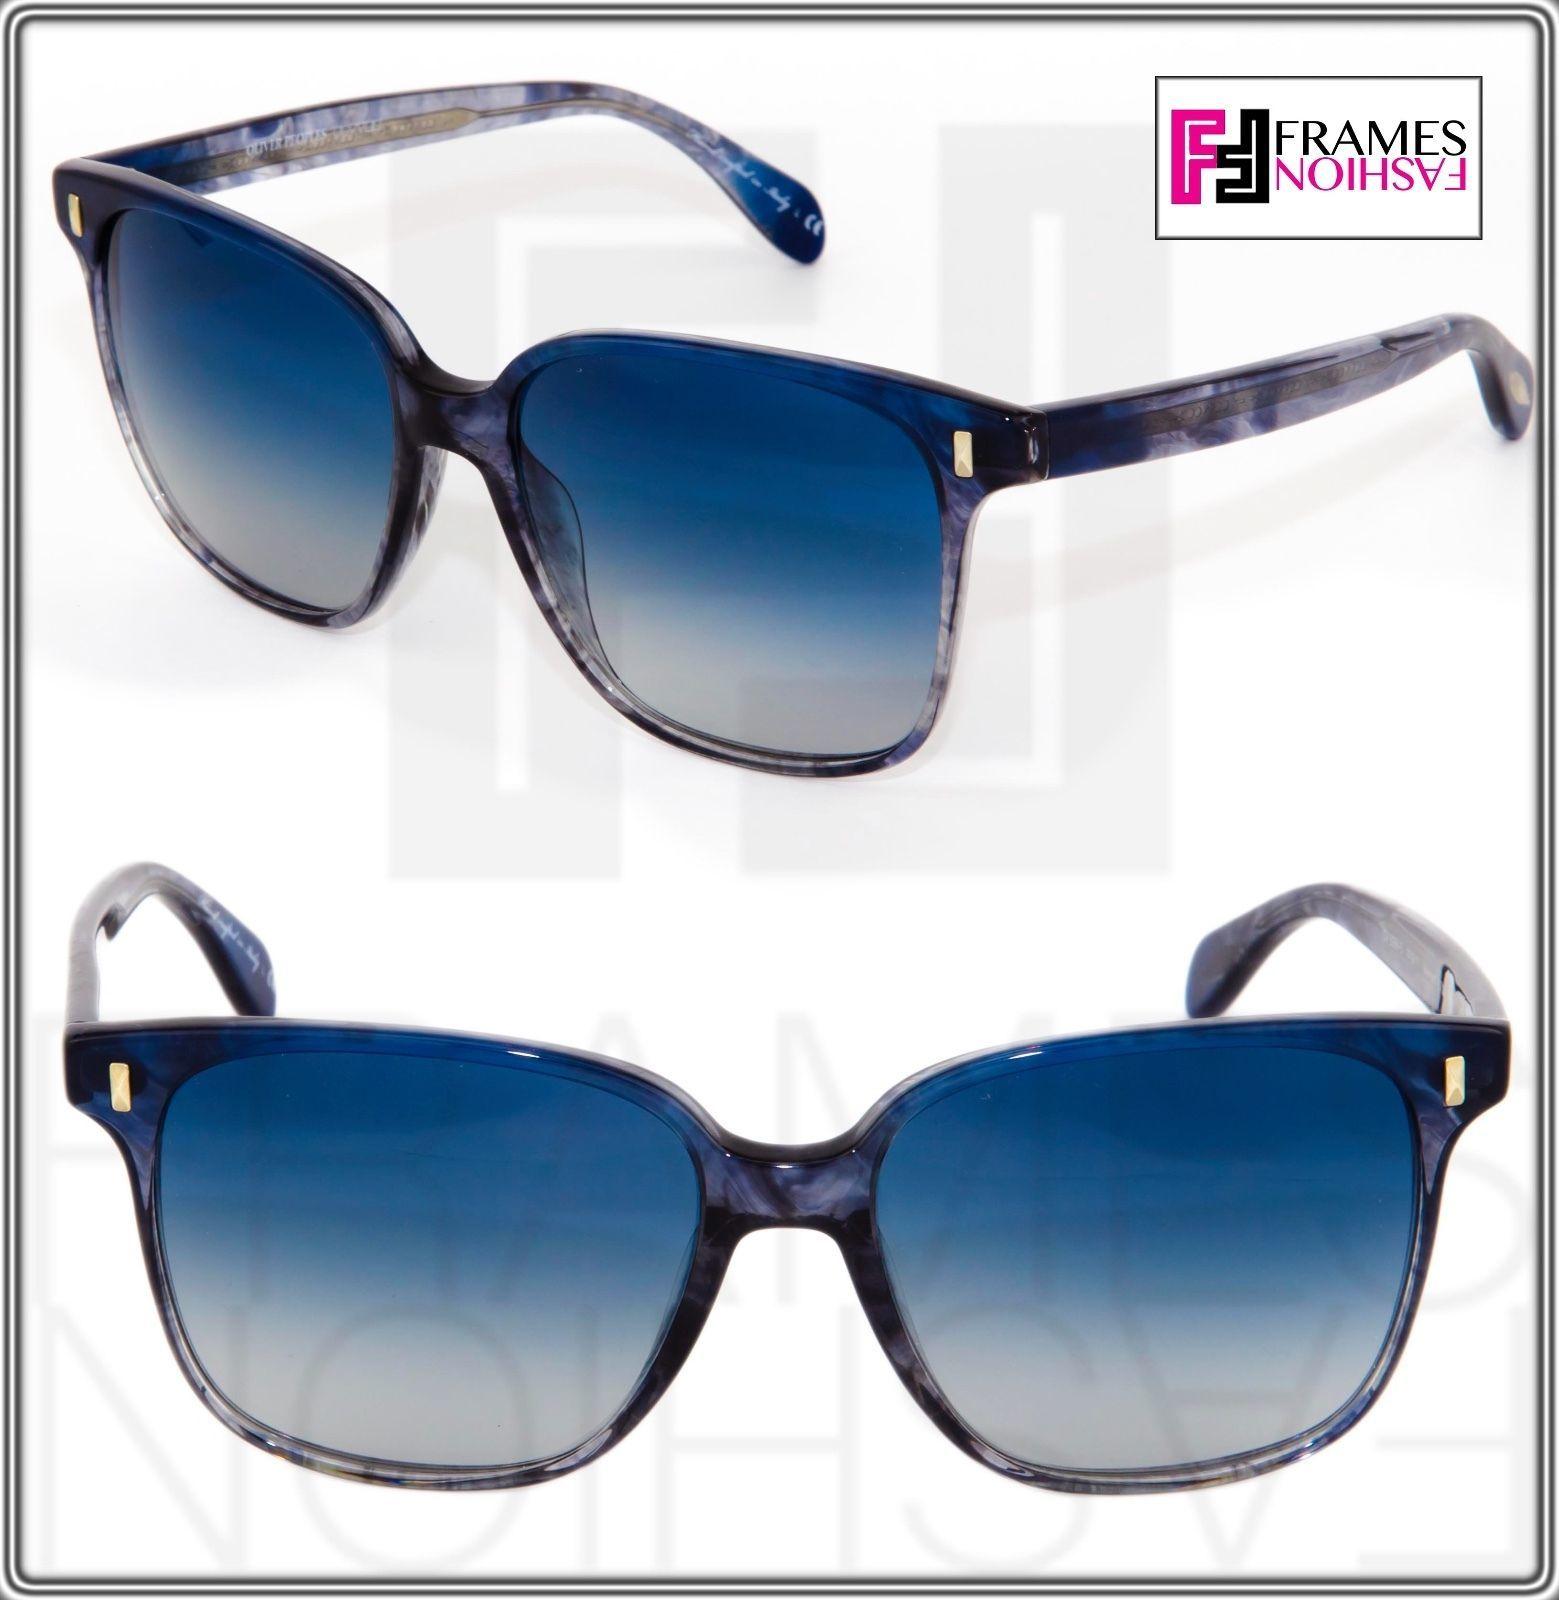 OLIVER PEOPLES MARMOT Square OV5266S Faded Sea Pacific Blue Sunglasses 5266